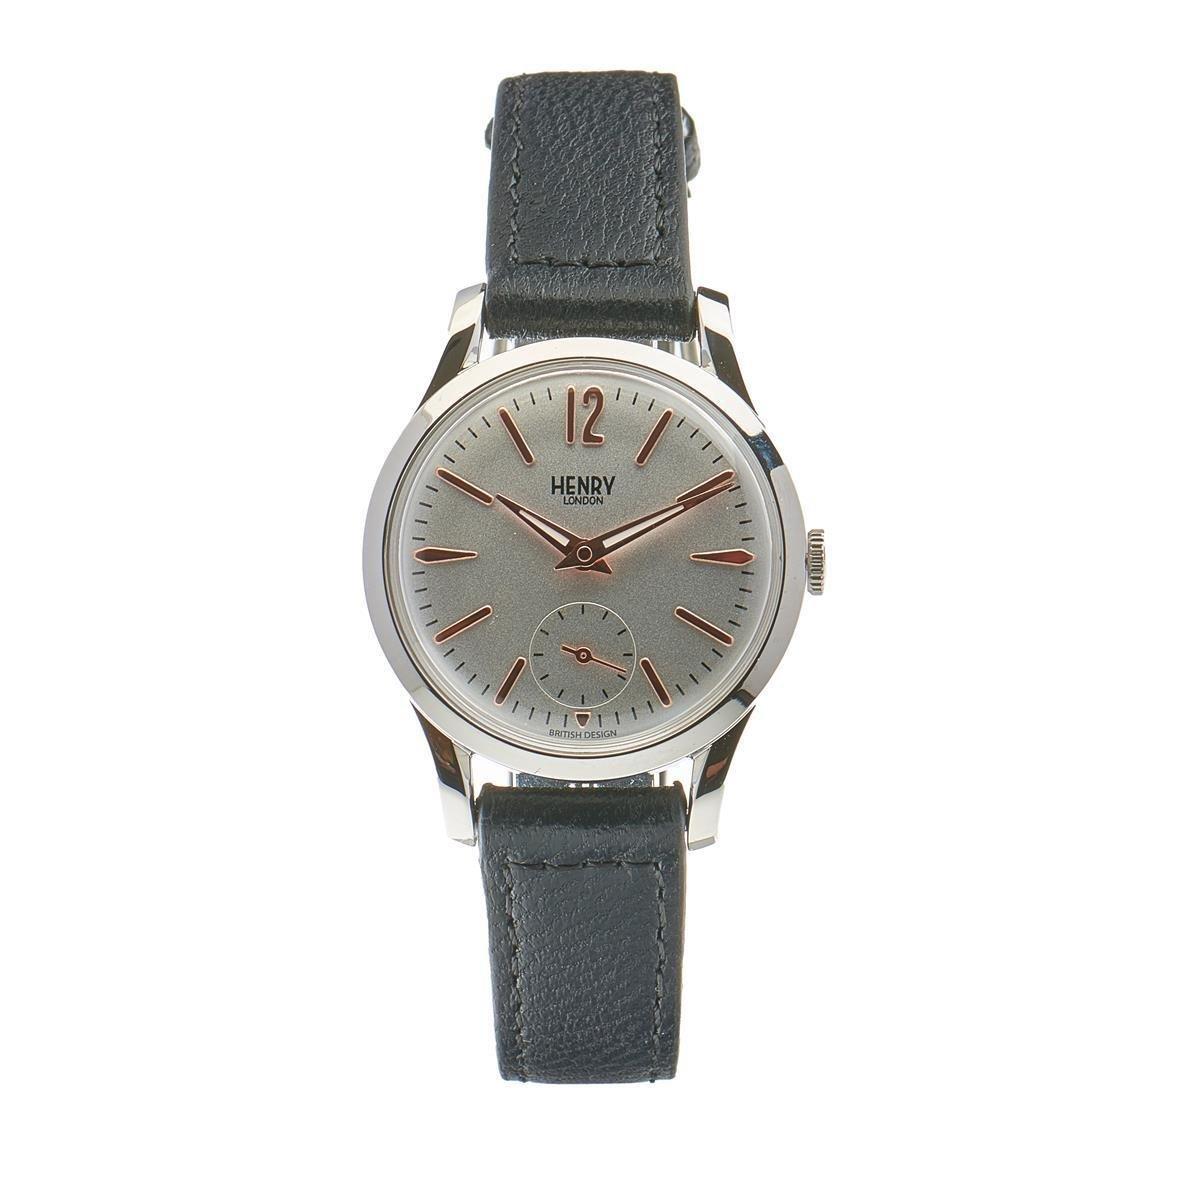 Unisex quartz wristwatch Henry London Highgate HL30-US-0001 (Renewed)